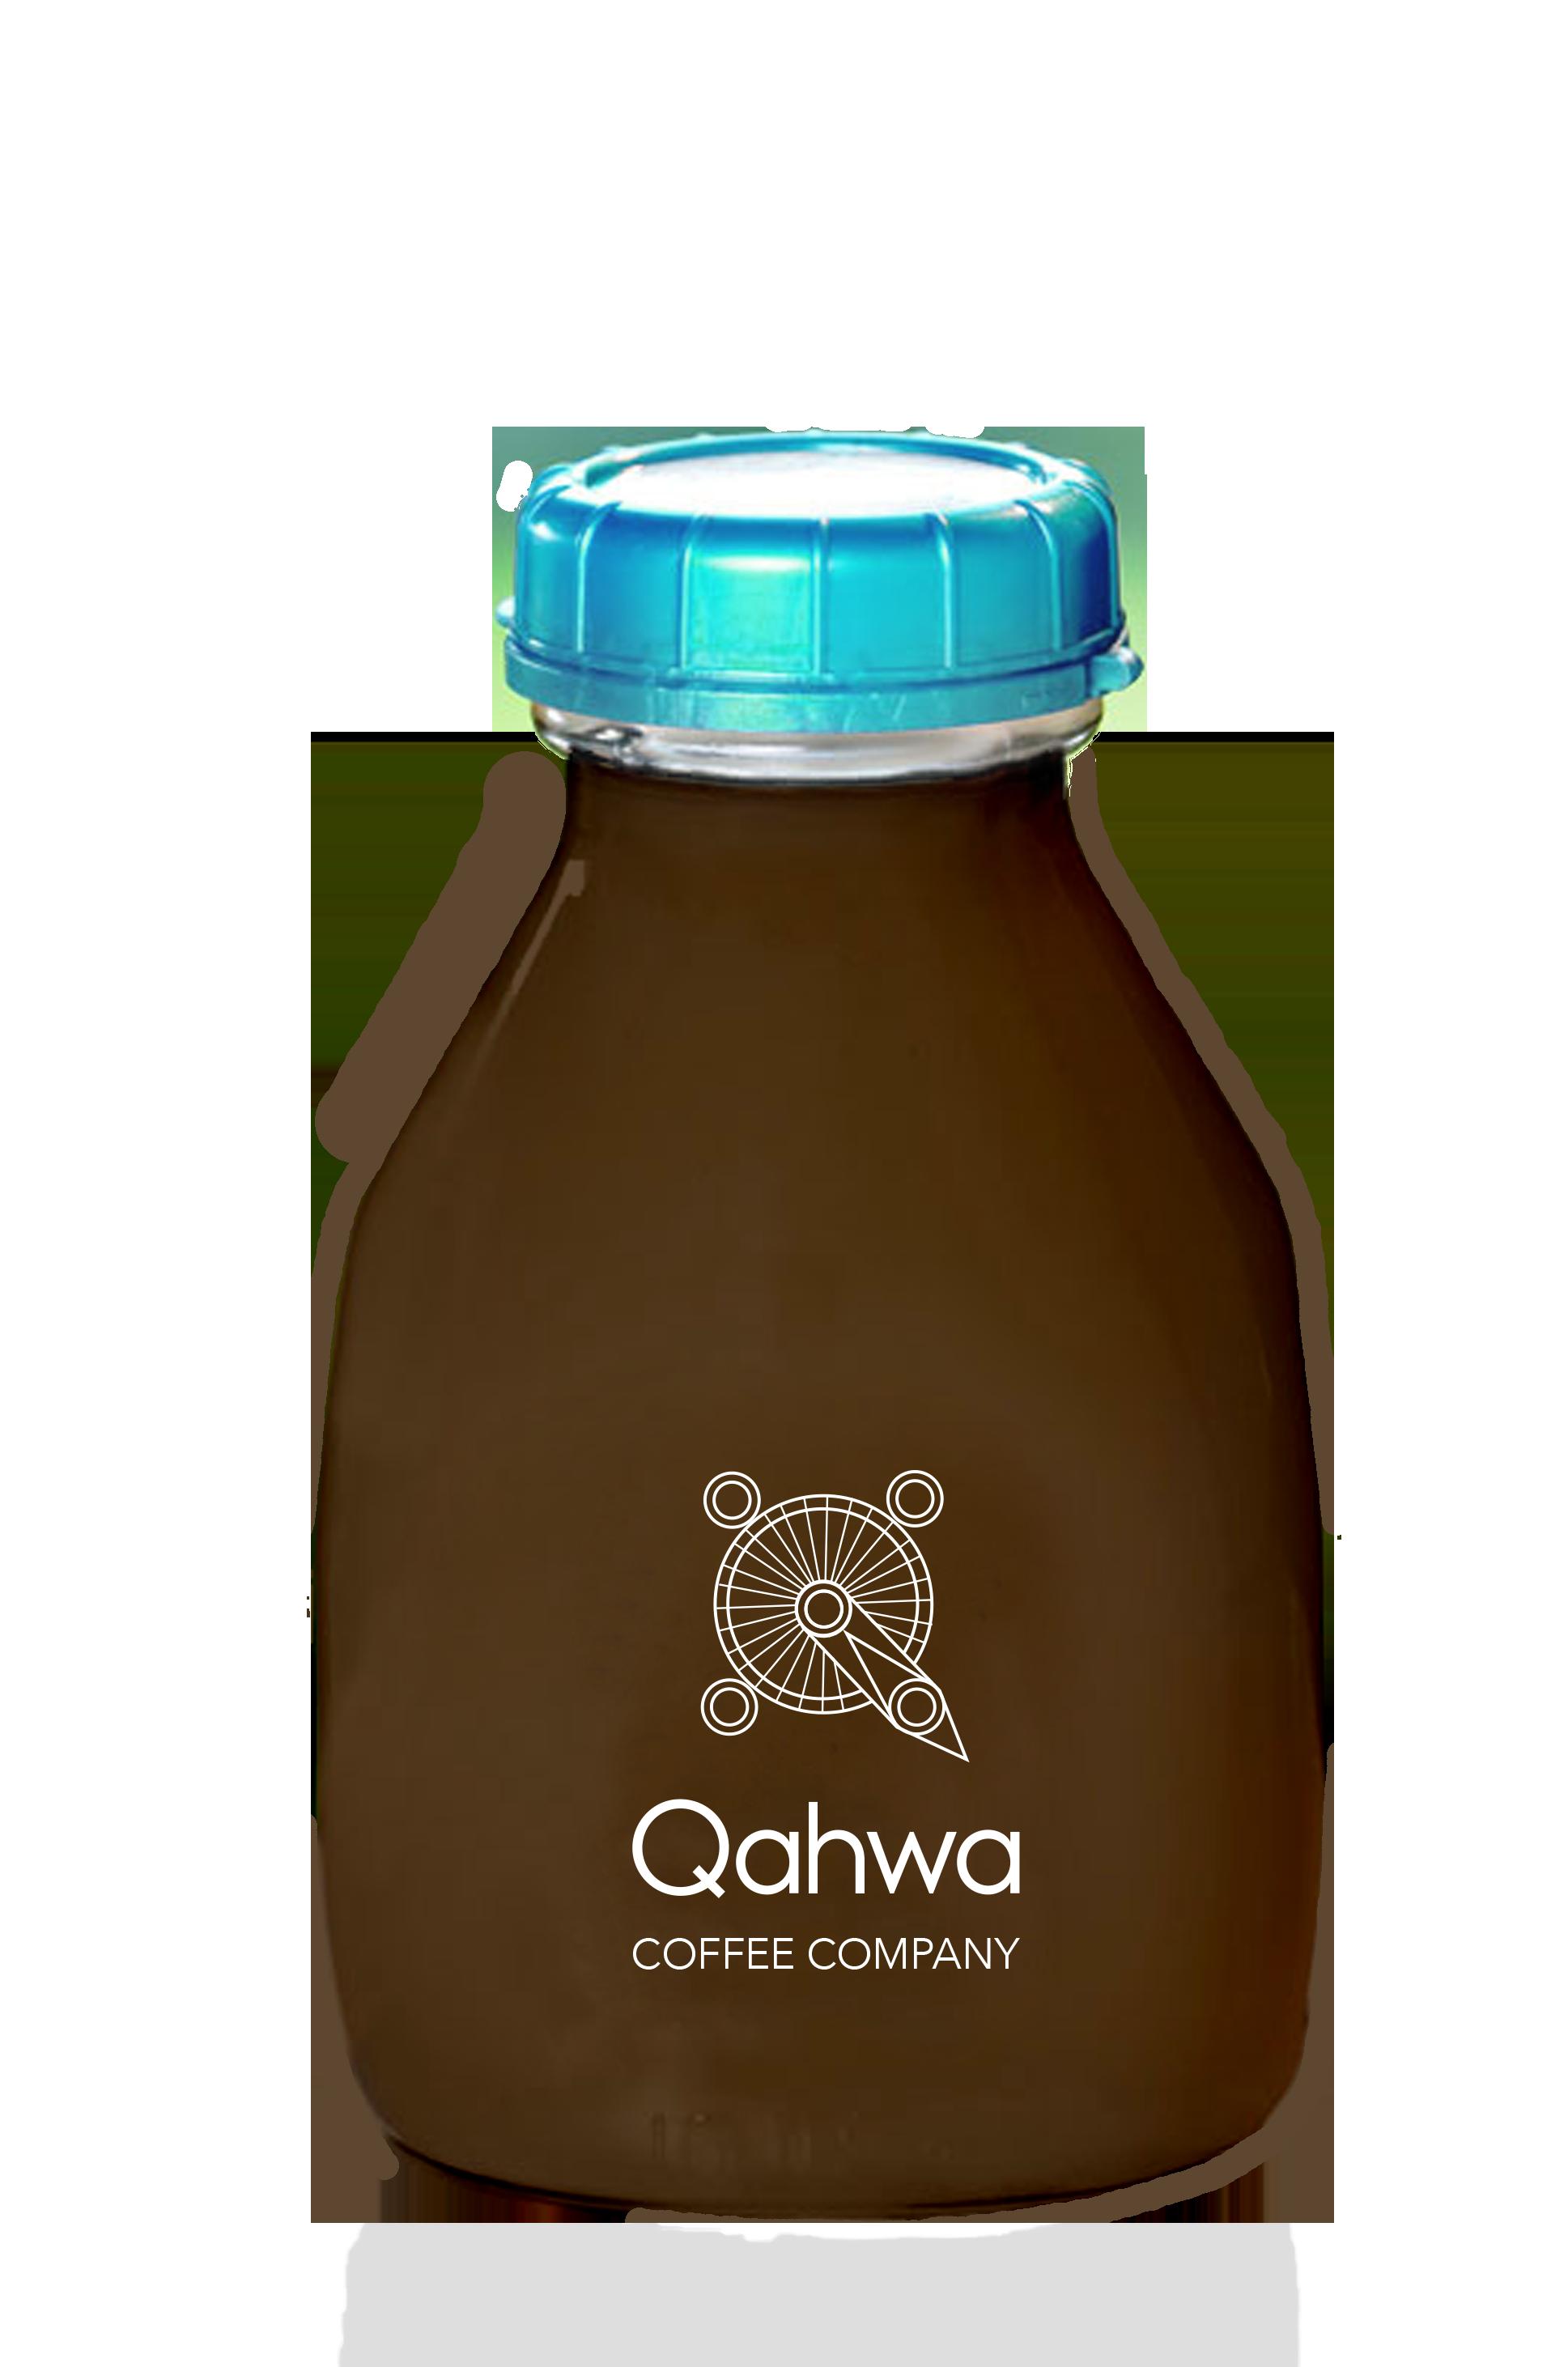 qahwa photo mockup transparent background.png